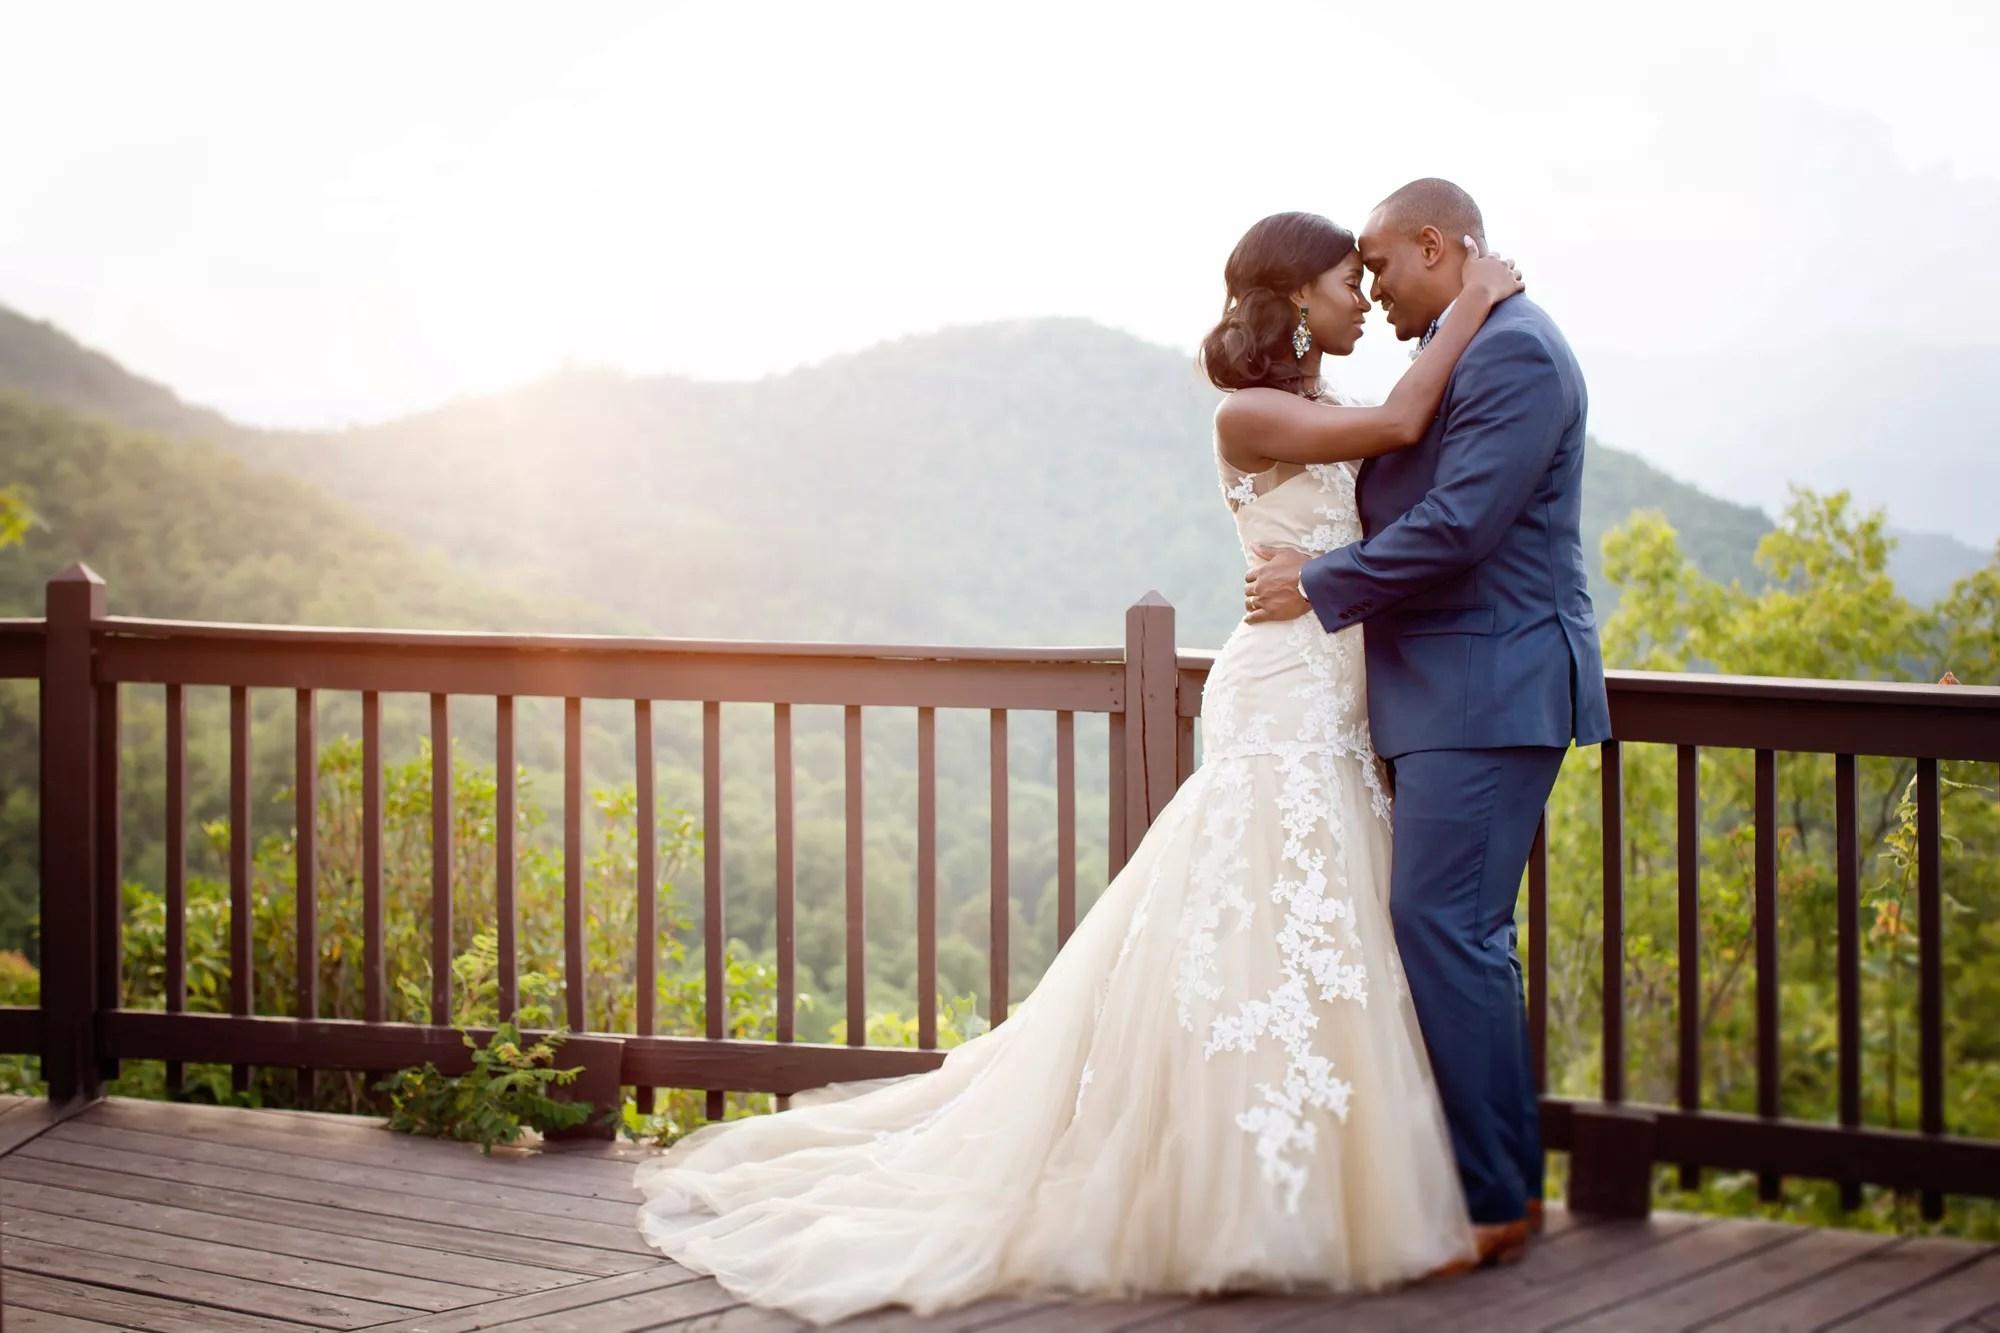 african american albums african american wedding dresses An Elegant Mountainside Wedding at Hawkesdene House in Andrews North Carolina